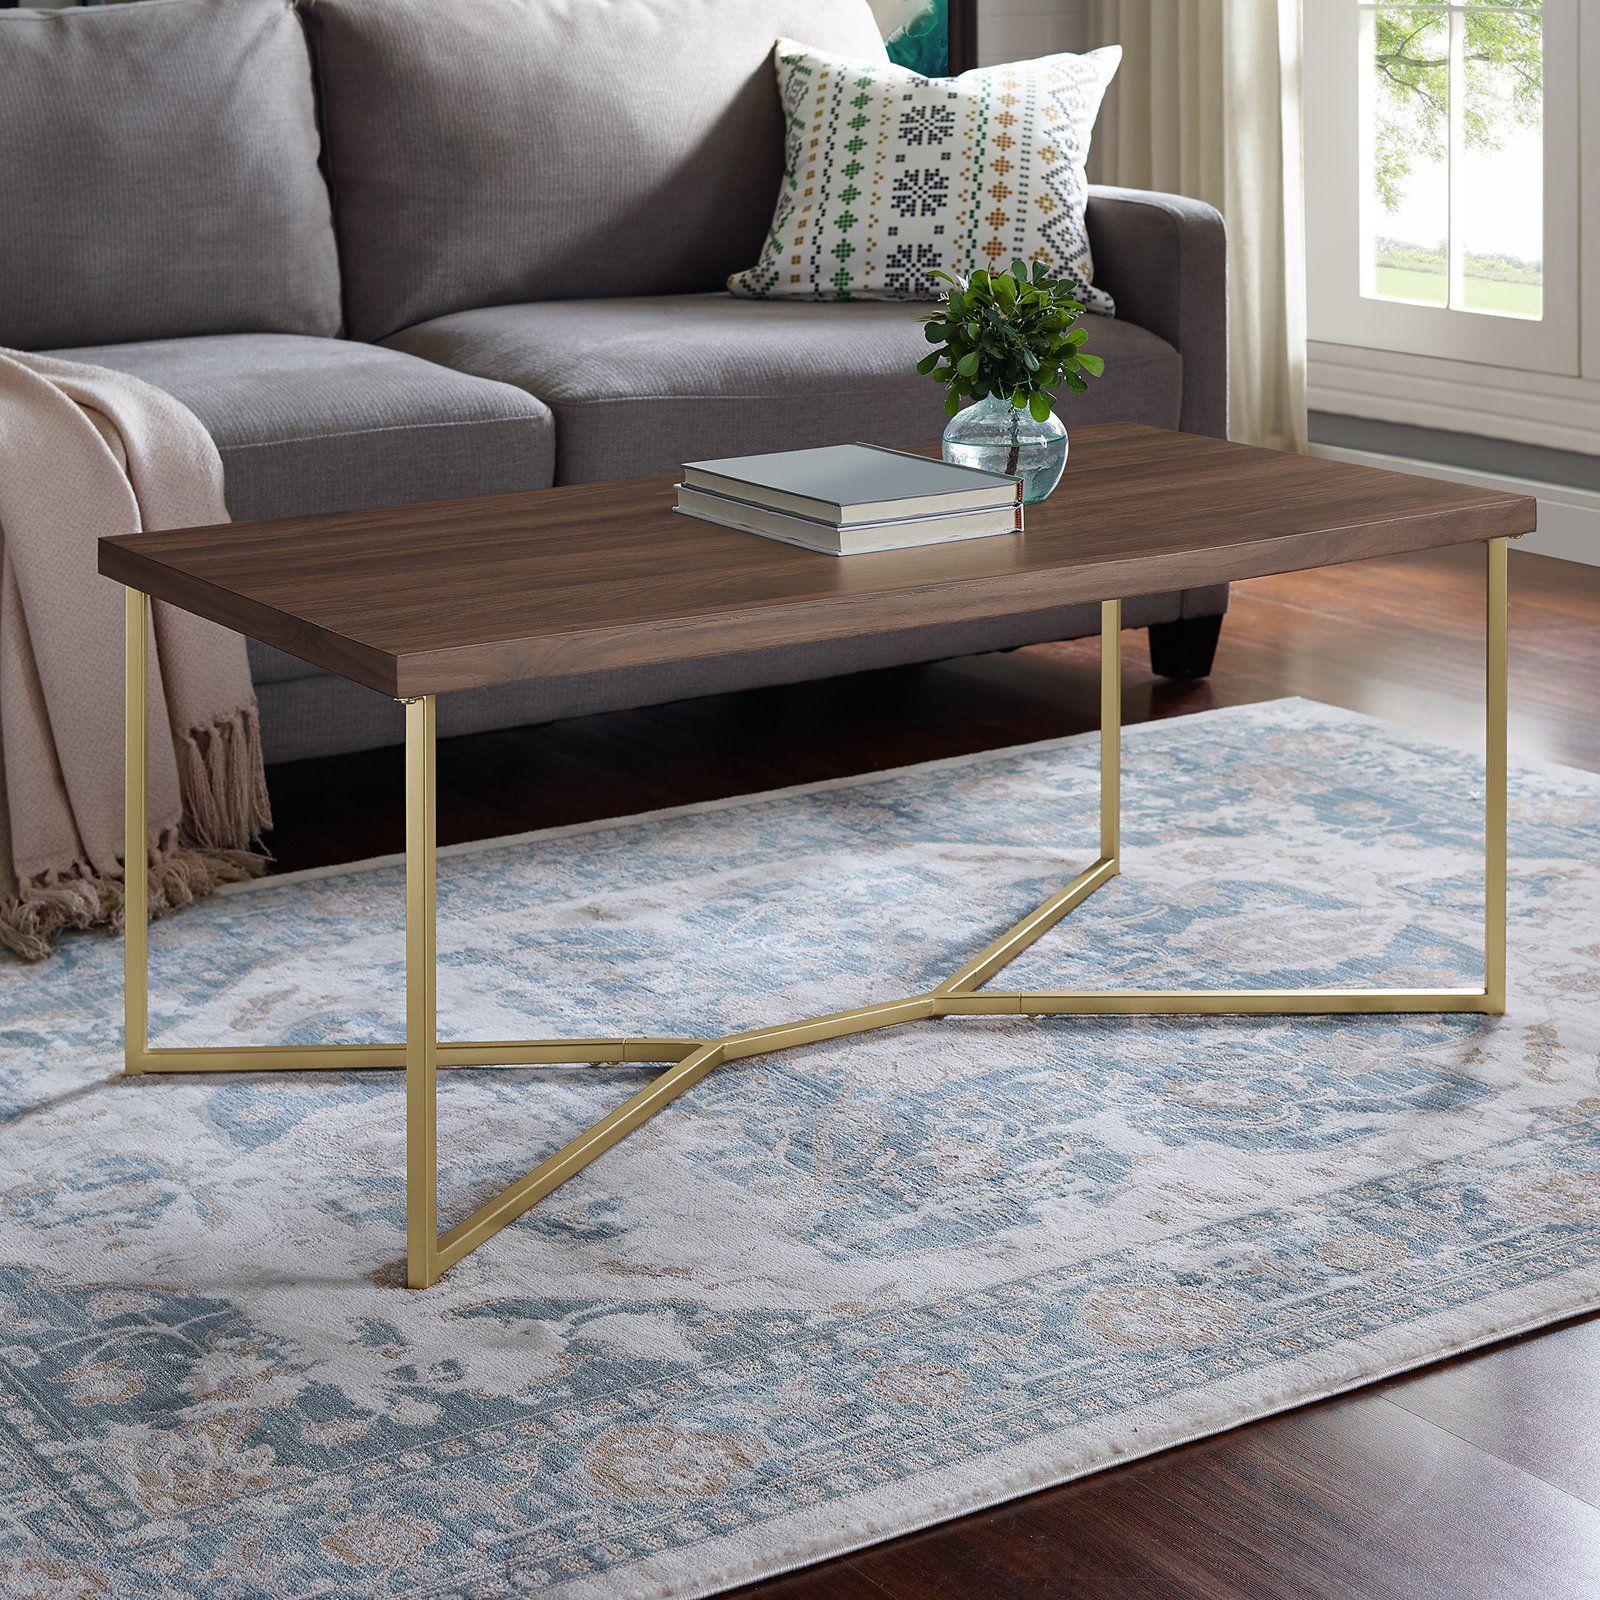 Manor Park Mid Century Modern Y Leg Coffee Table In 2020 Coffee Table Gold Coffee Table Walnut Coffee Table [ 1600 x 1600 Pixel ]